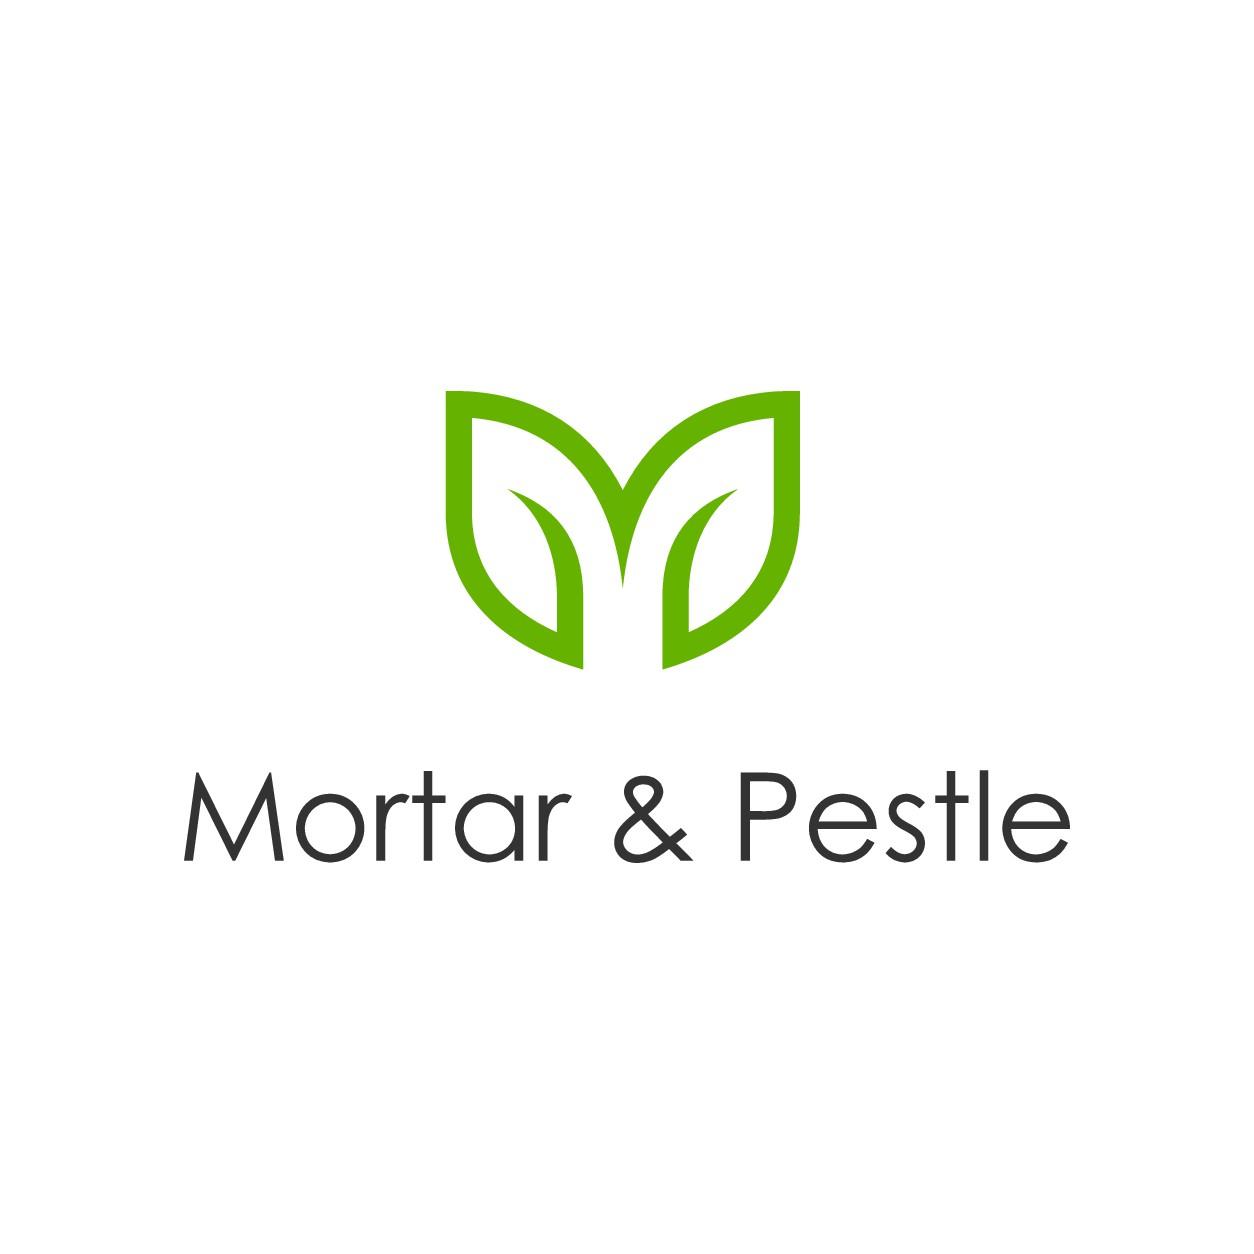 Mortar & Pestle Logo Design Contest